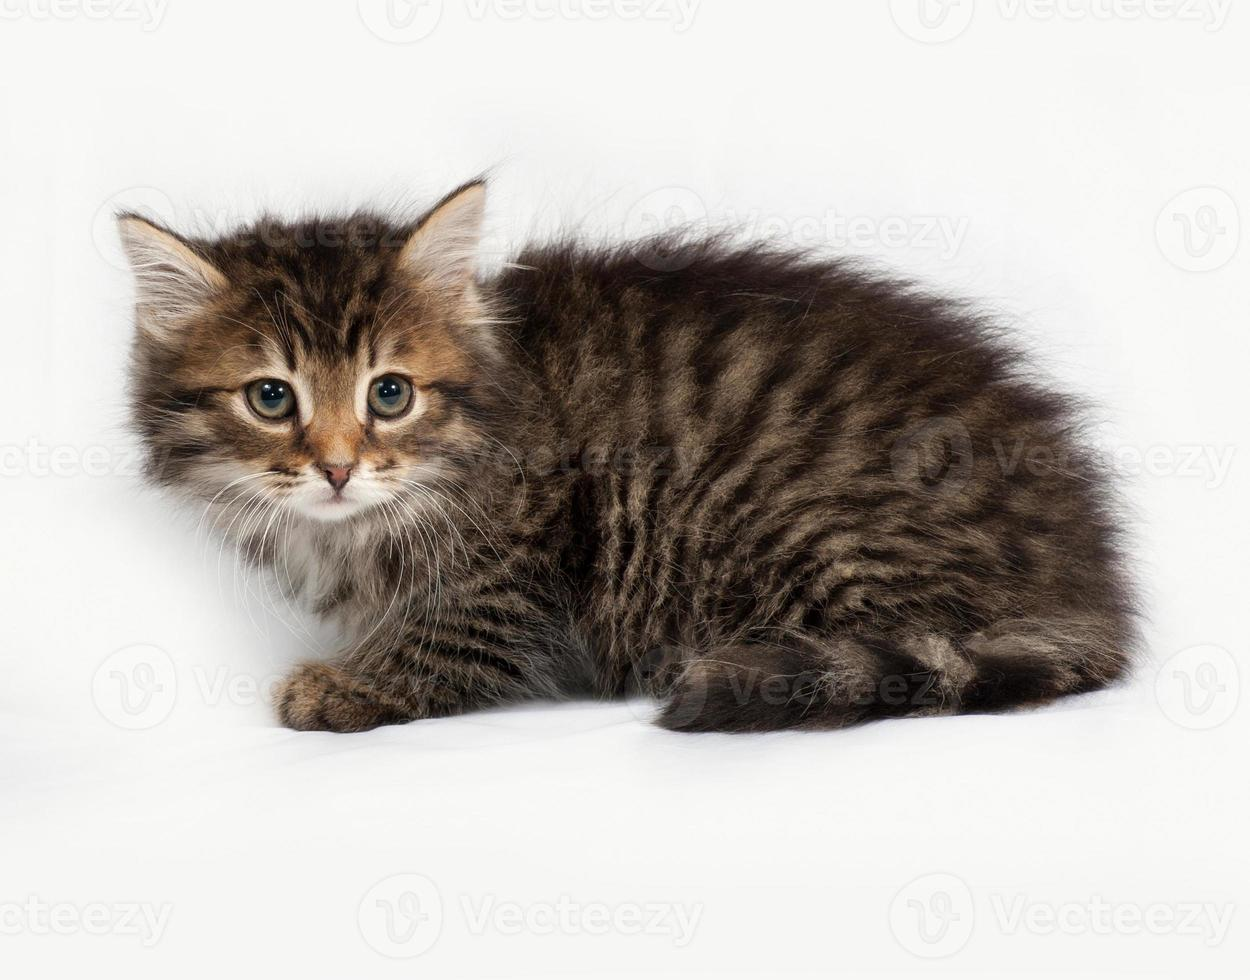 Fluffy Siberian striped kitten sitting on gray photo